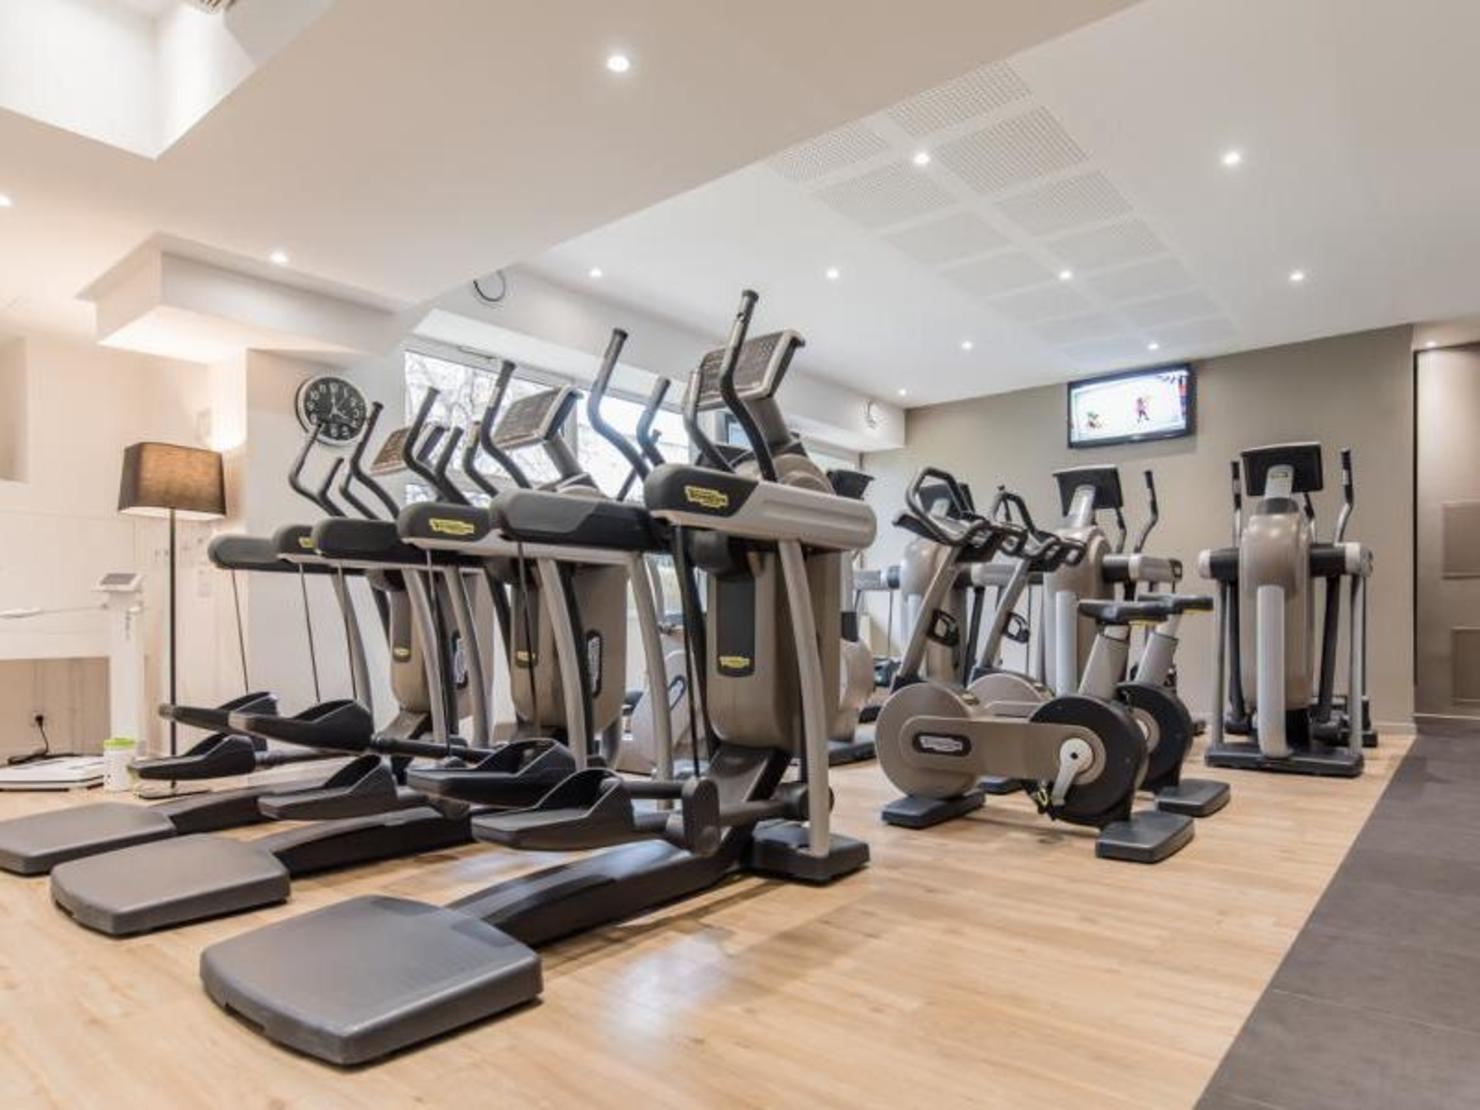 win fitness lyon 8 tarifs avis horaires essai gratuit